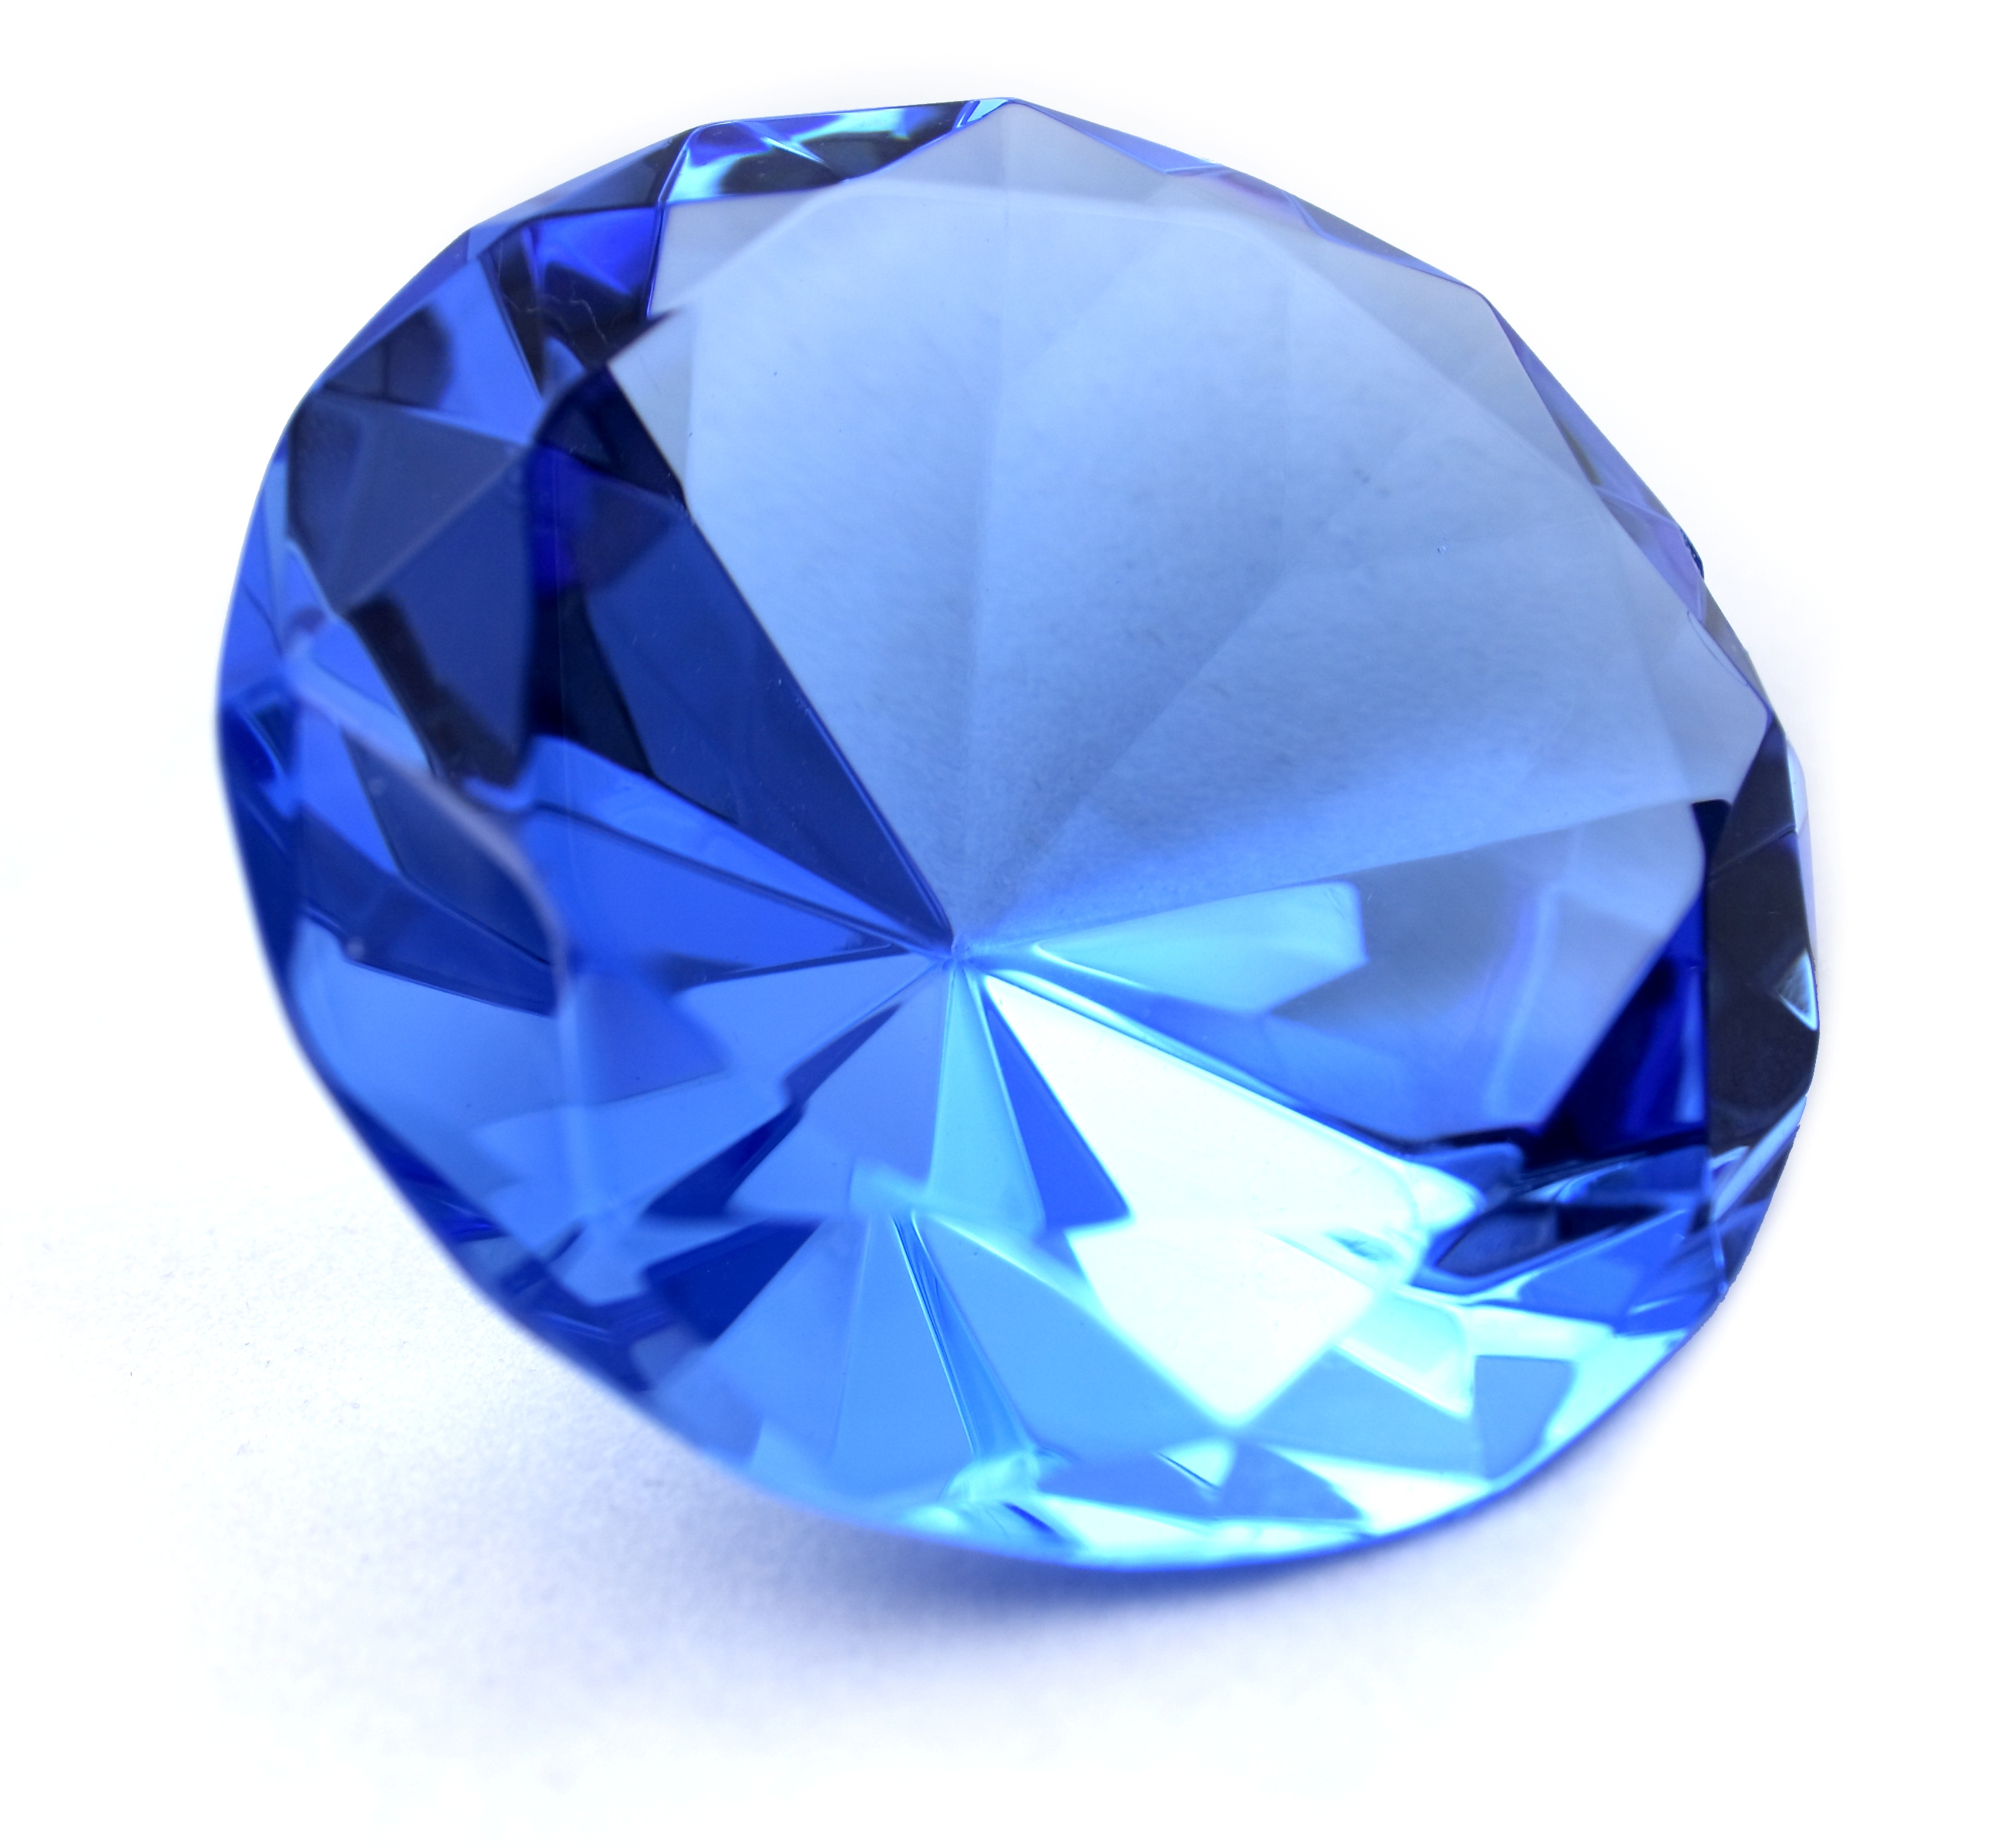 Gems clipart sapphire State gem Sapphire (29+) Clipart